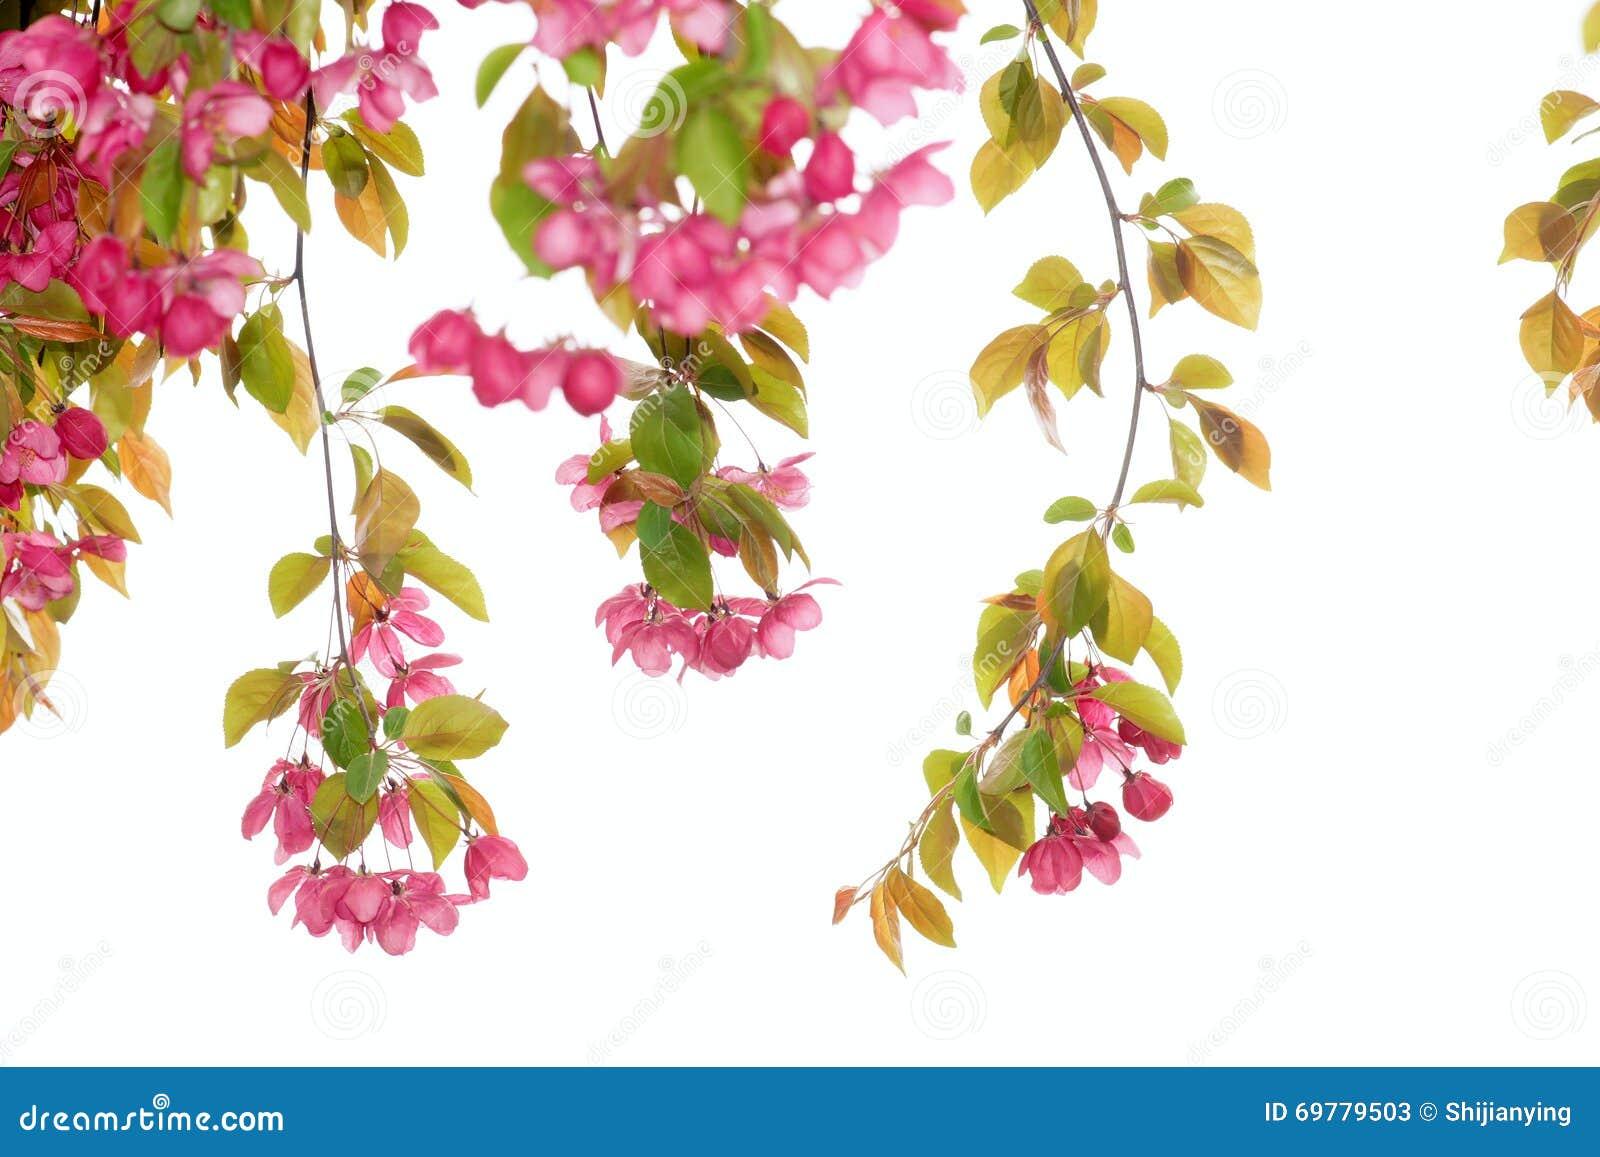 Crabapple Flowers Stock Image Image Of Plant Flower 69779503